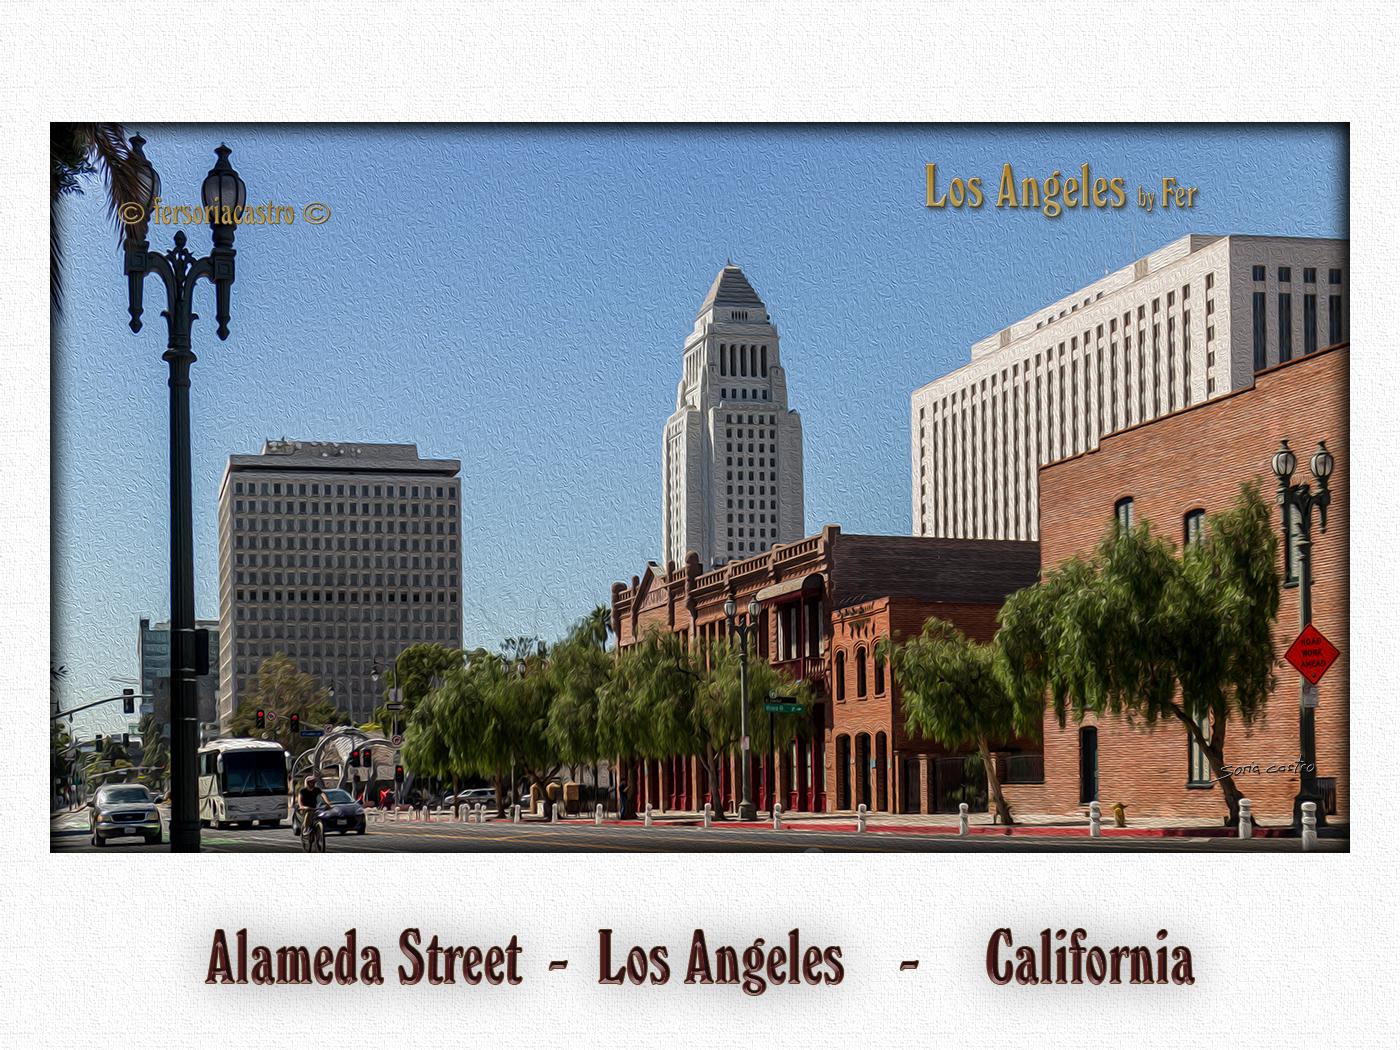 Alameda Street